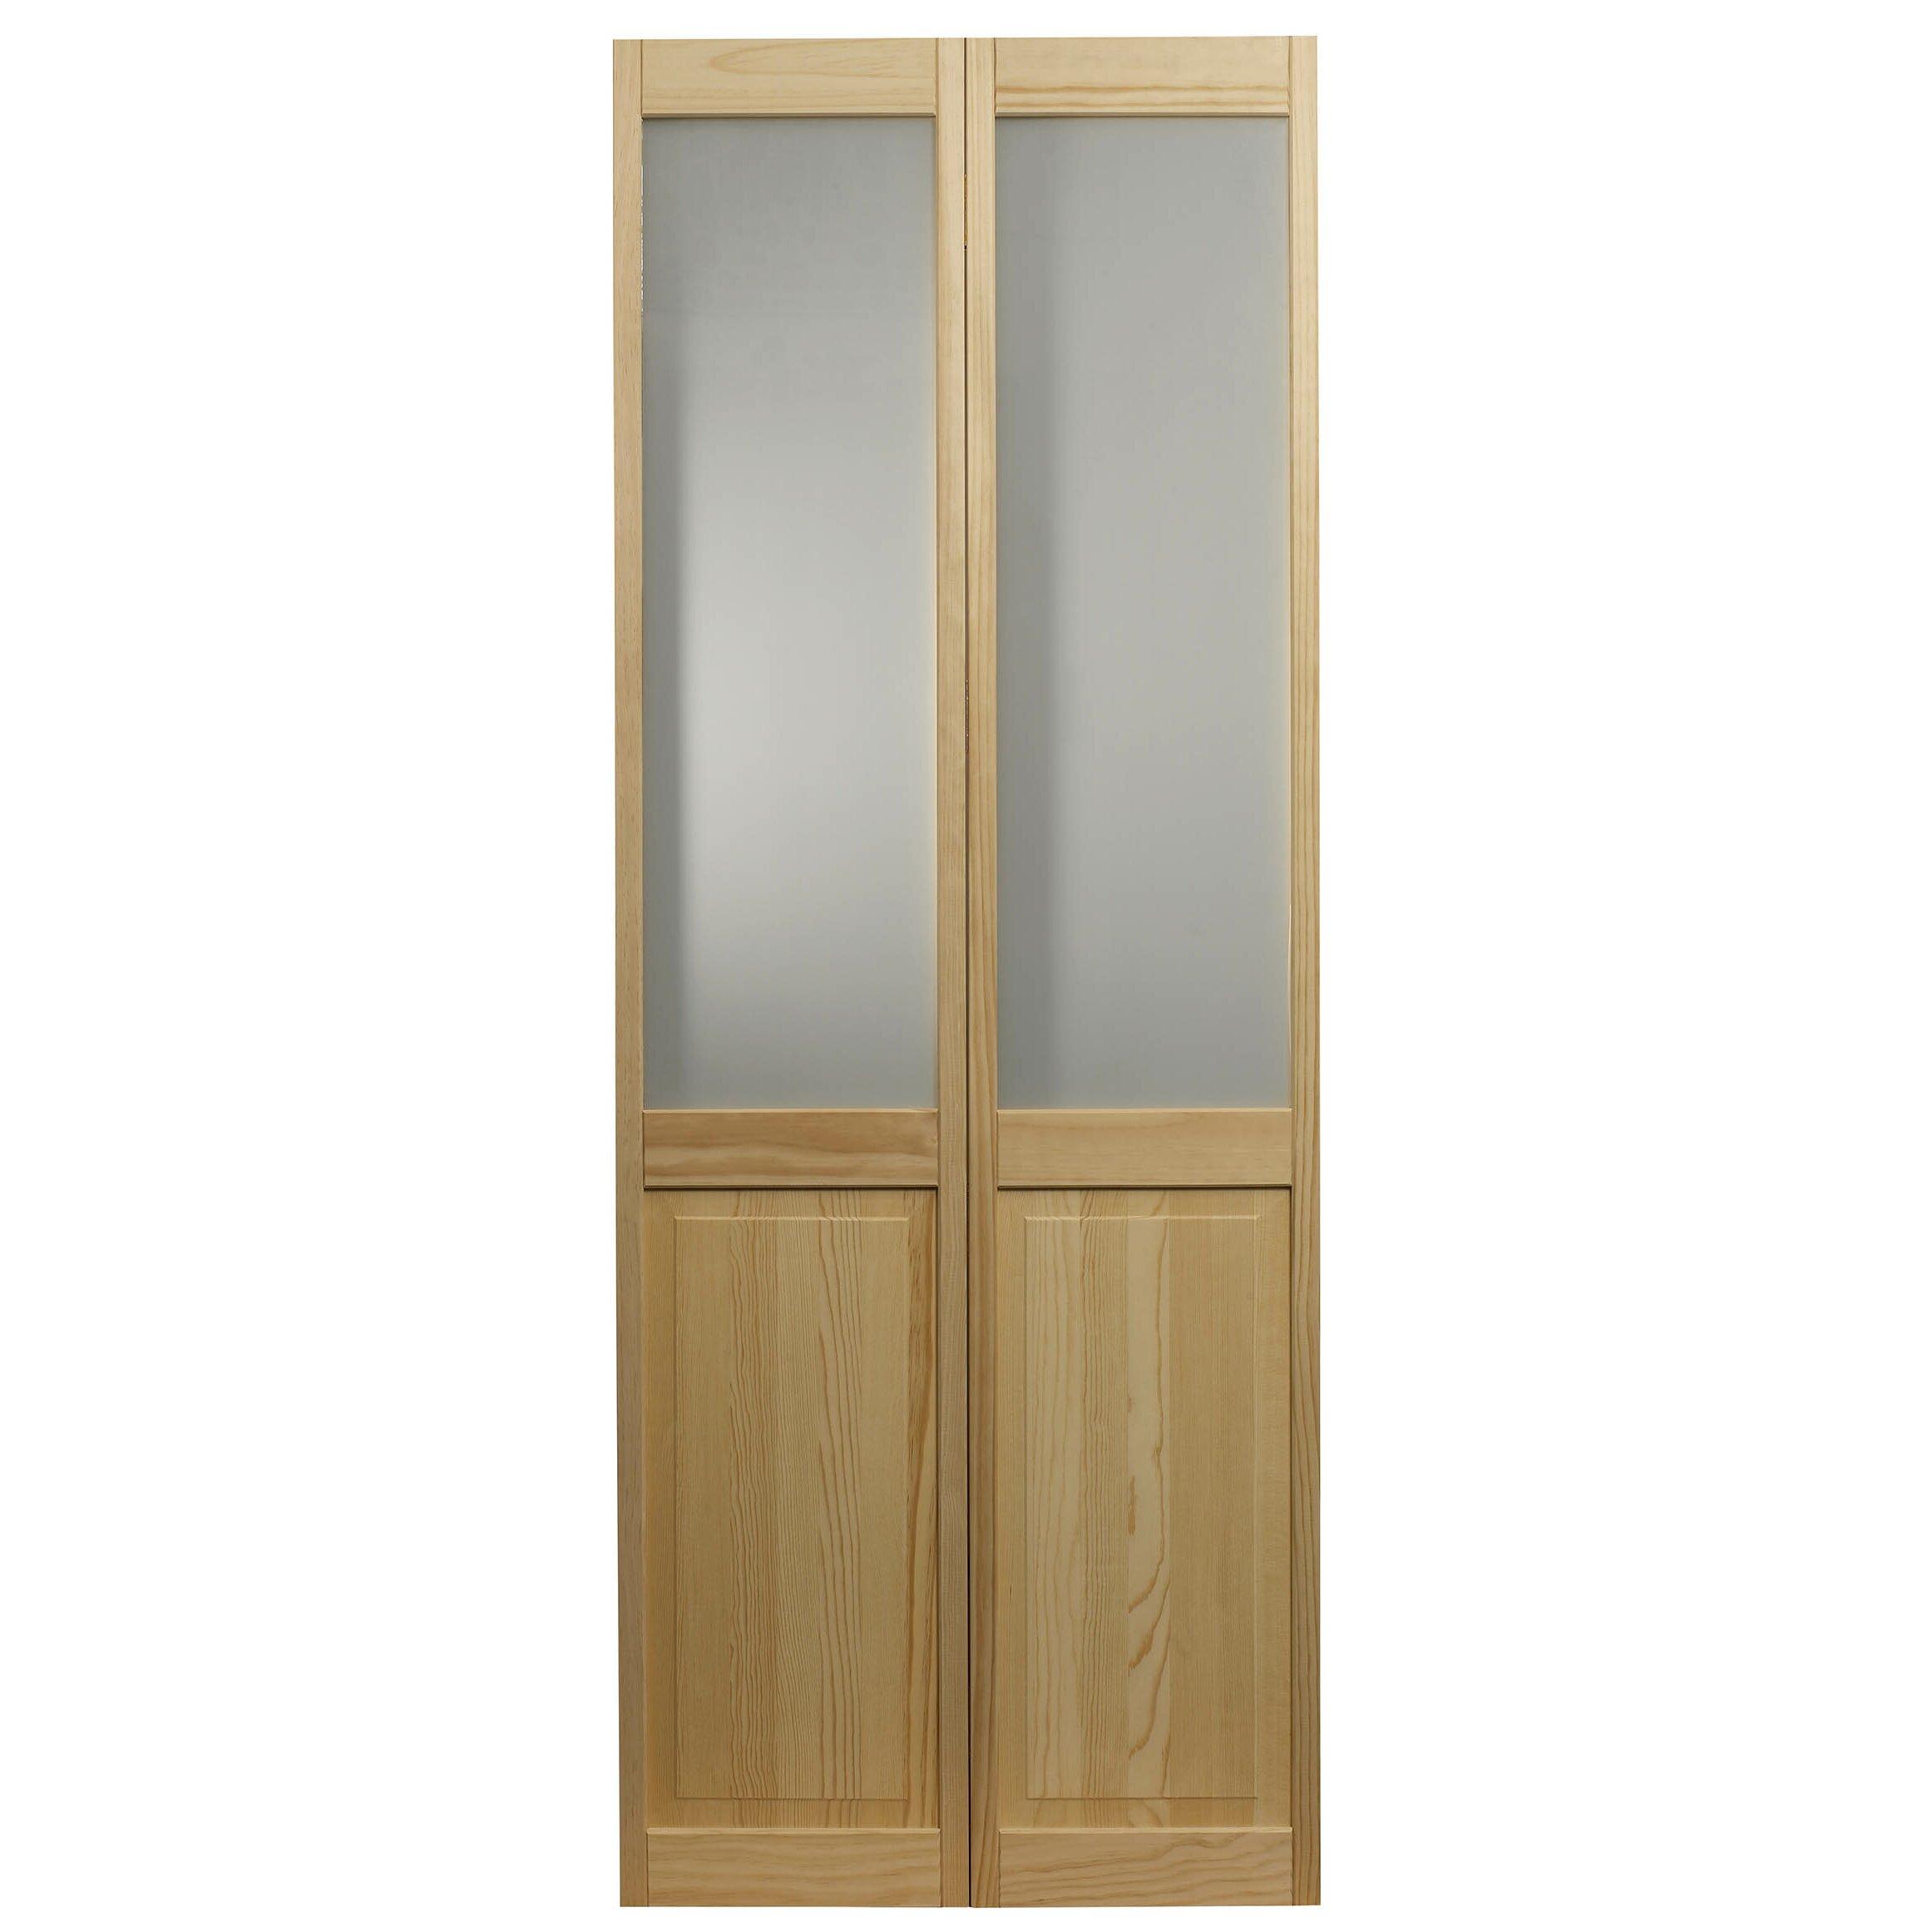 Ltl Bi Fold Doors Pinecroft Pine Wood Bi Fold Interior Door Reviews